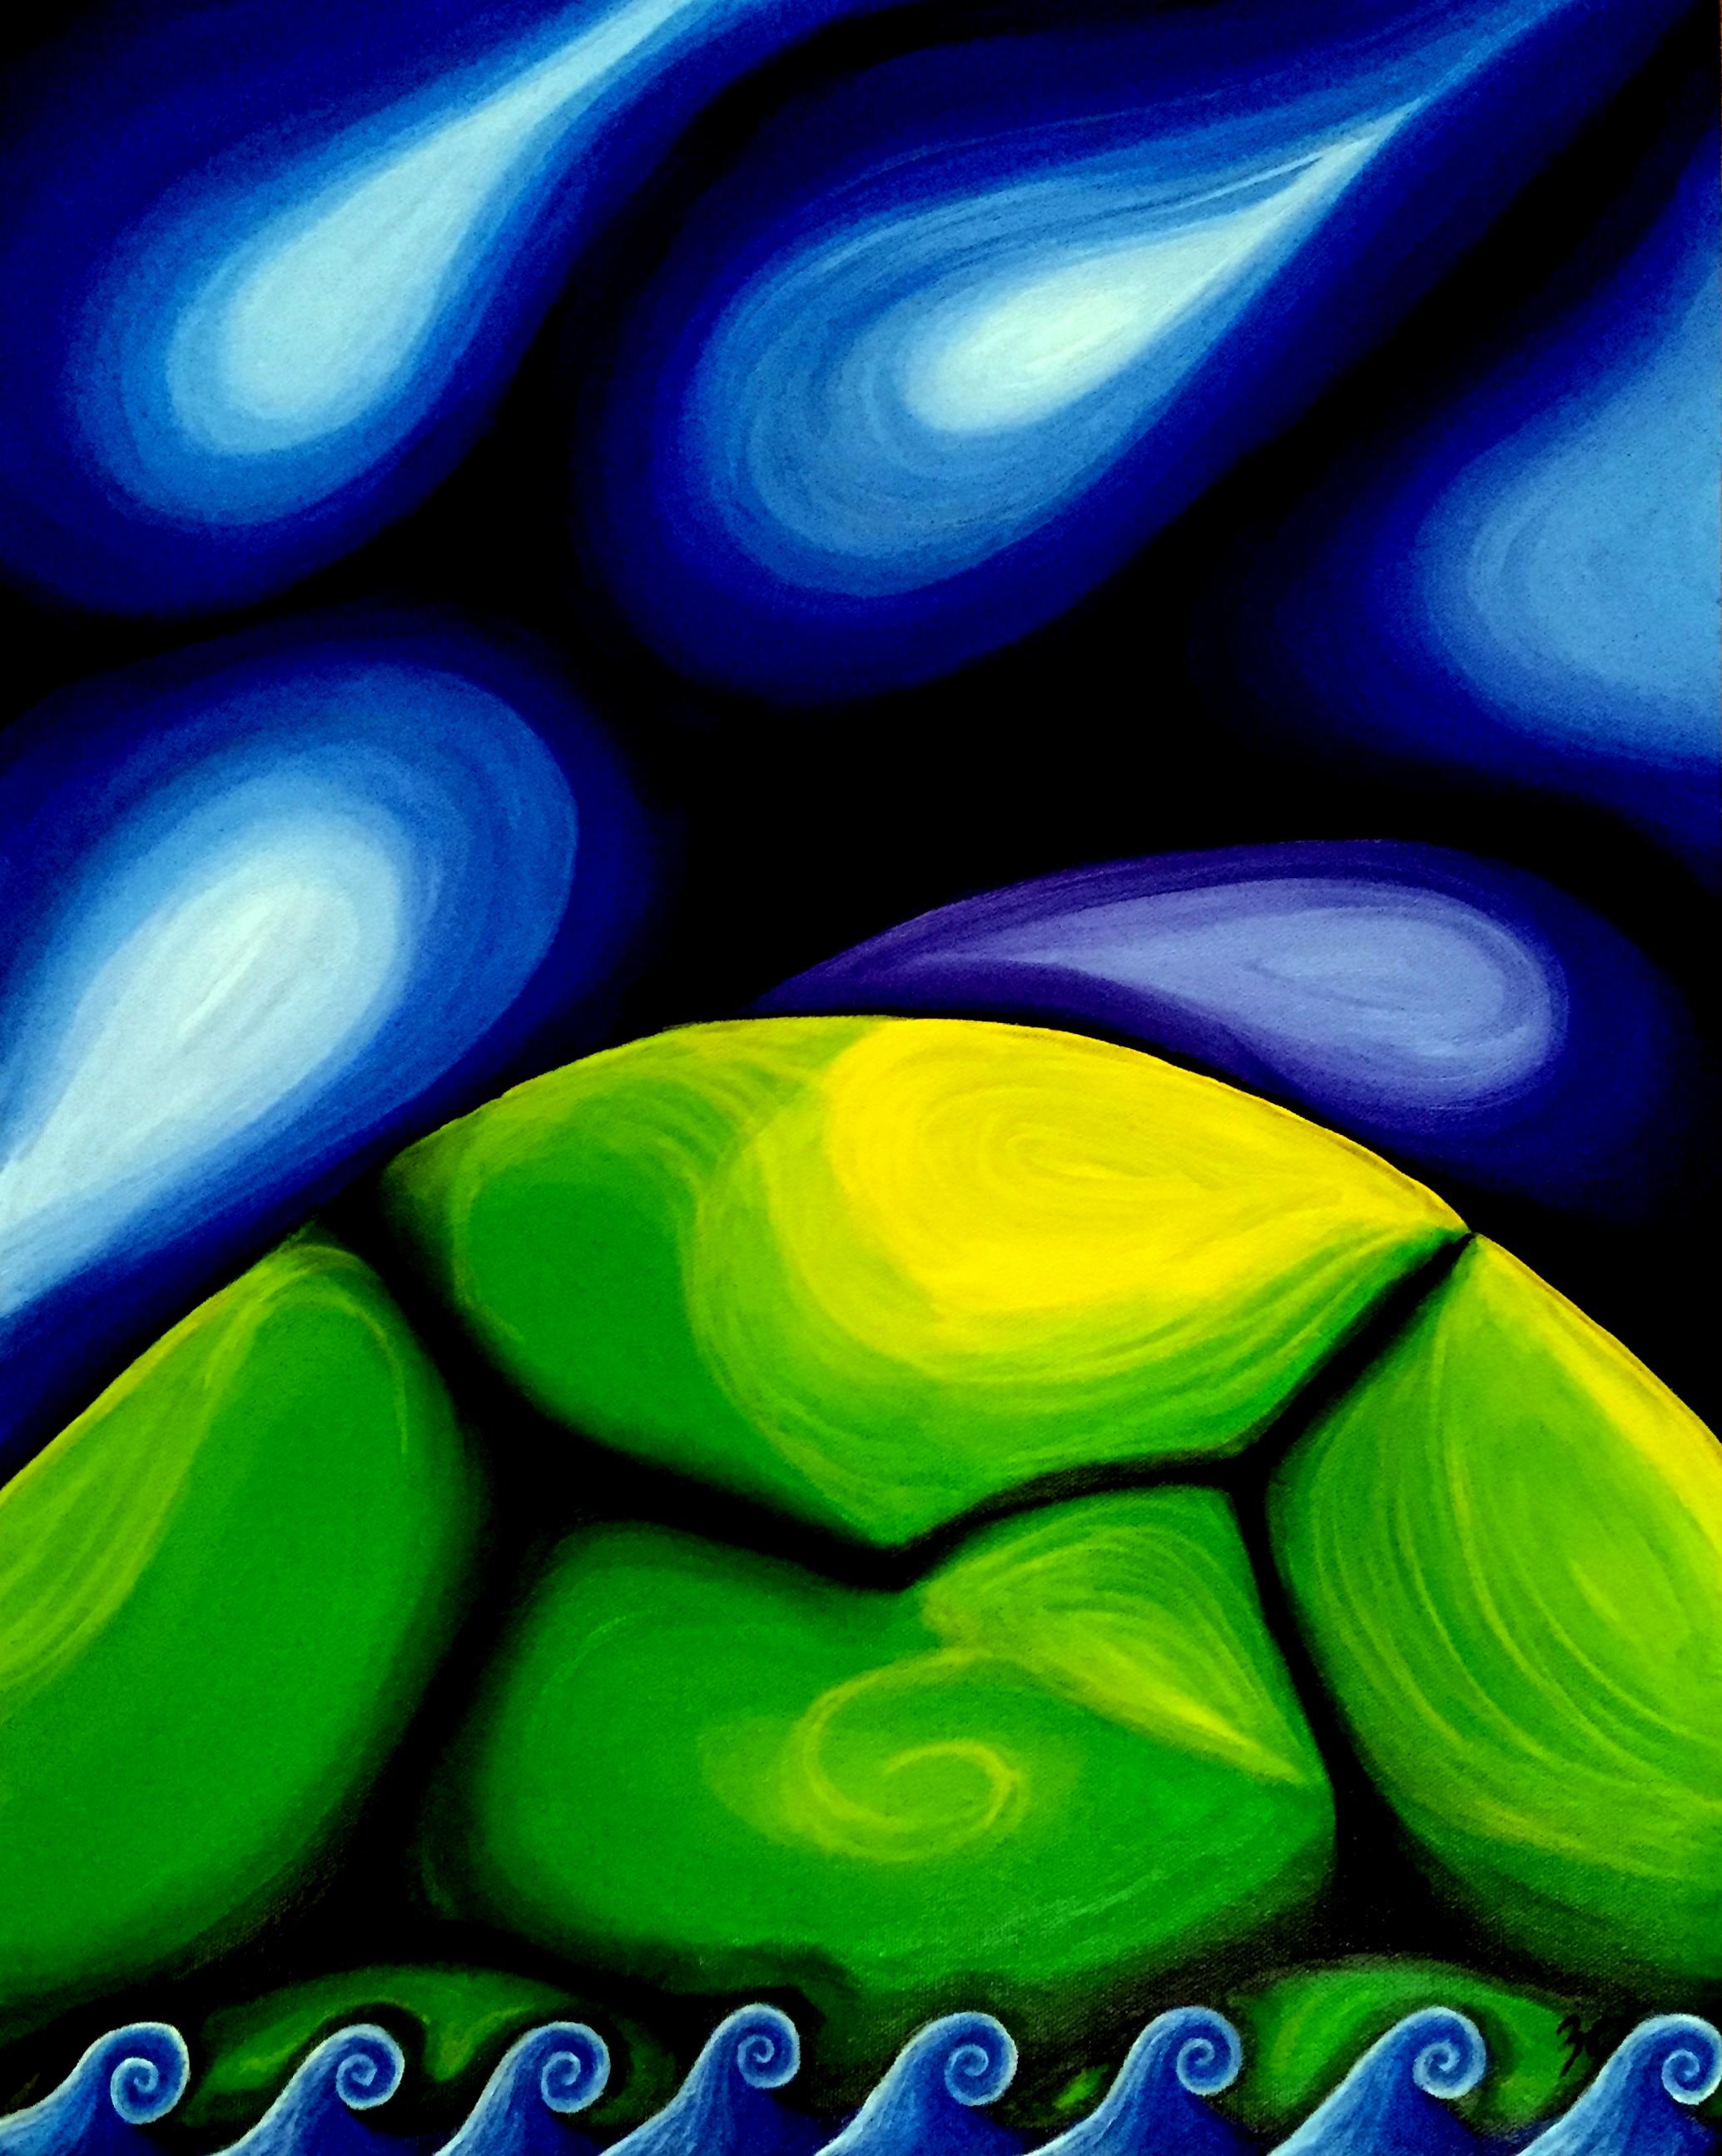 K'ok (Turtle)